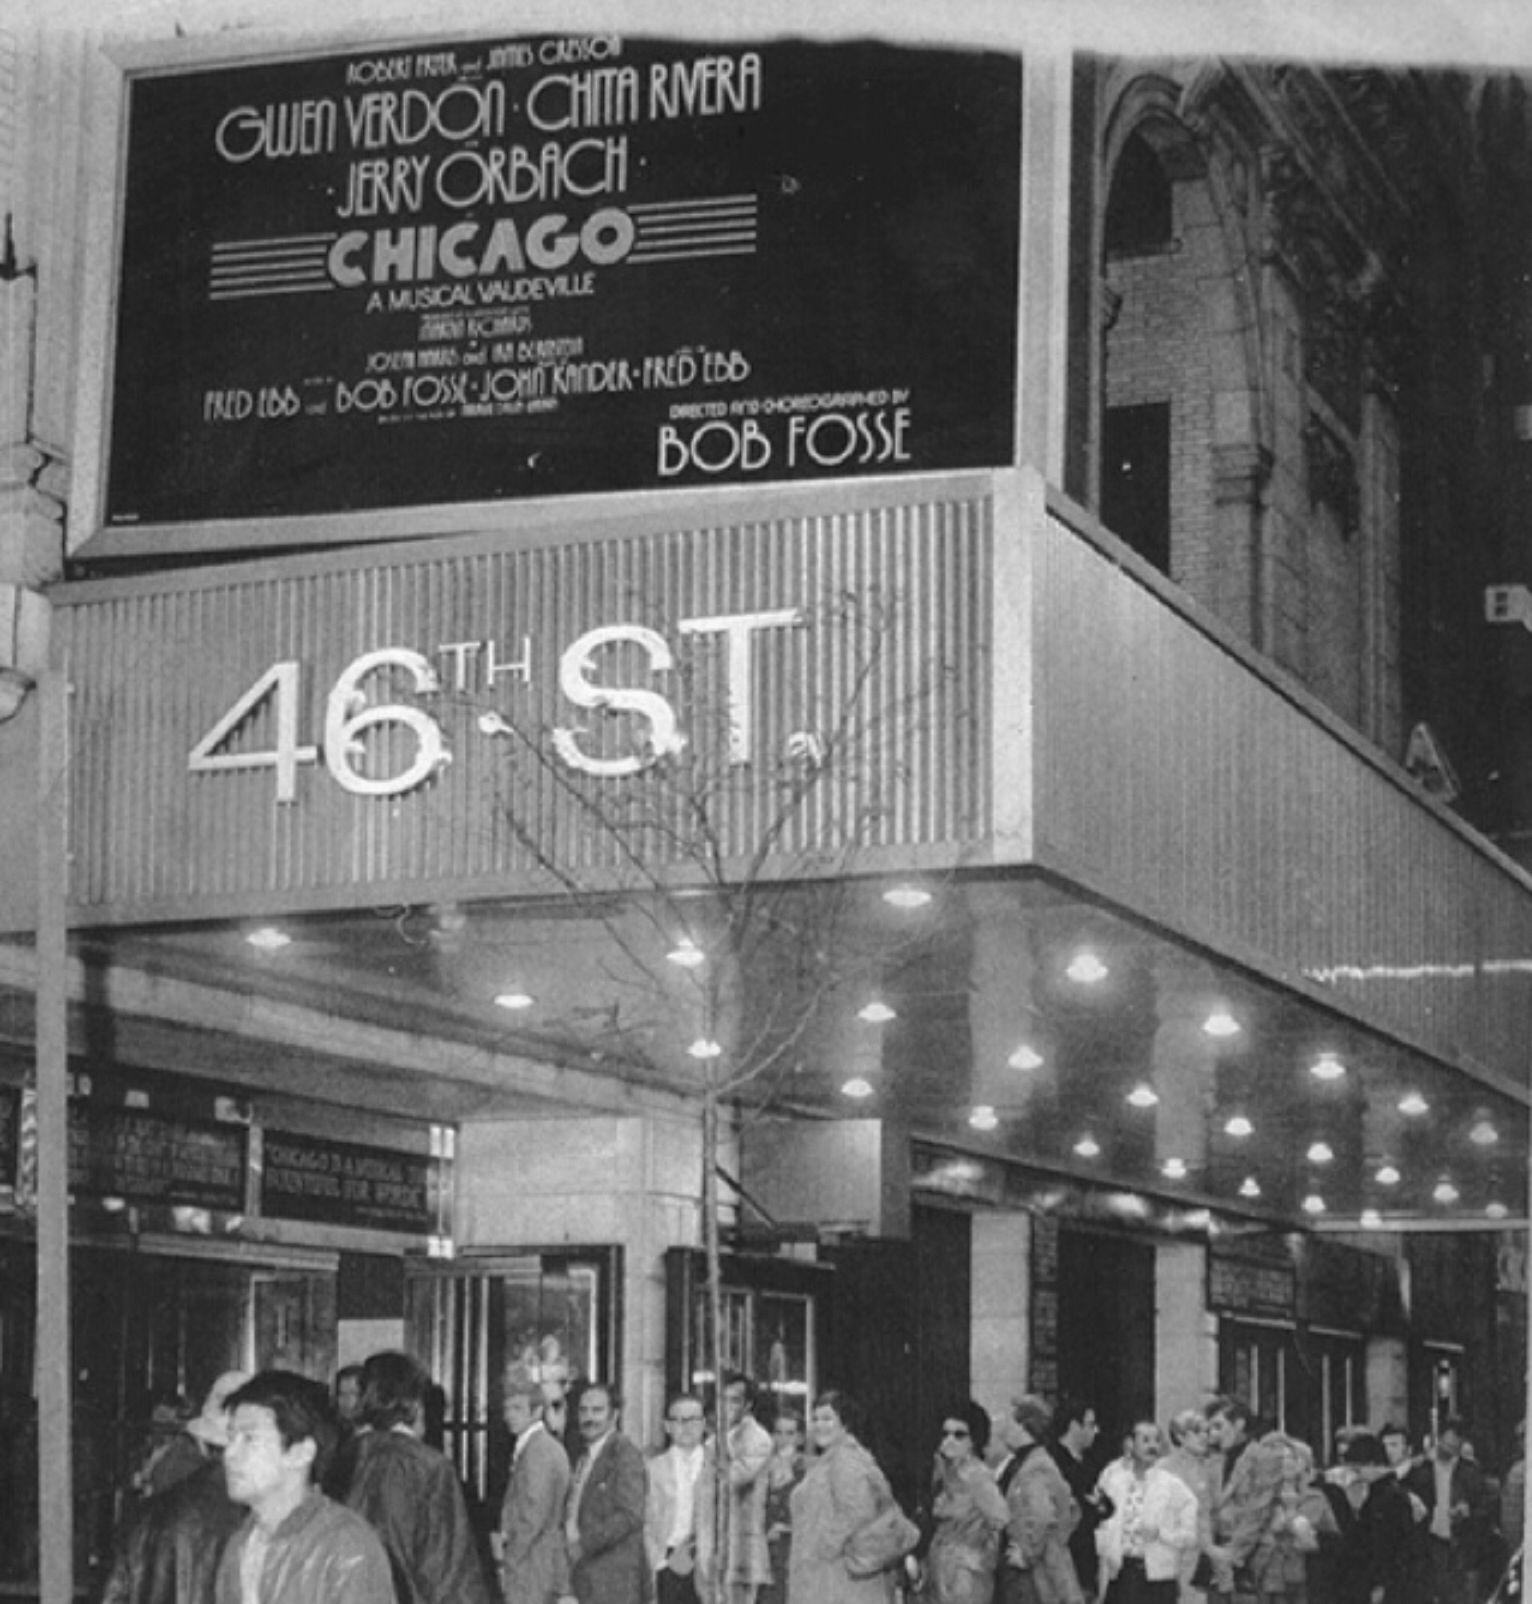 Chicago Music By John Kander Book By Fred Ebb Bob Fosse Lyrics By Fred Ebb Jerry Orbach Chita Rivera Gwen Verdon Barne Broadway Movie Marquee Bob Fosse